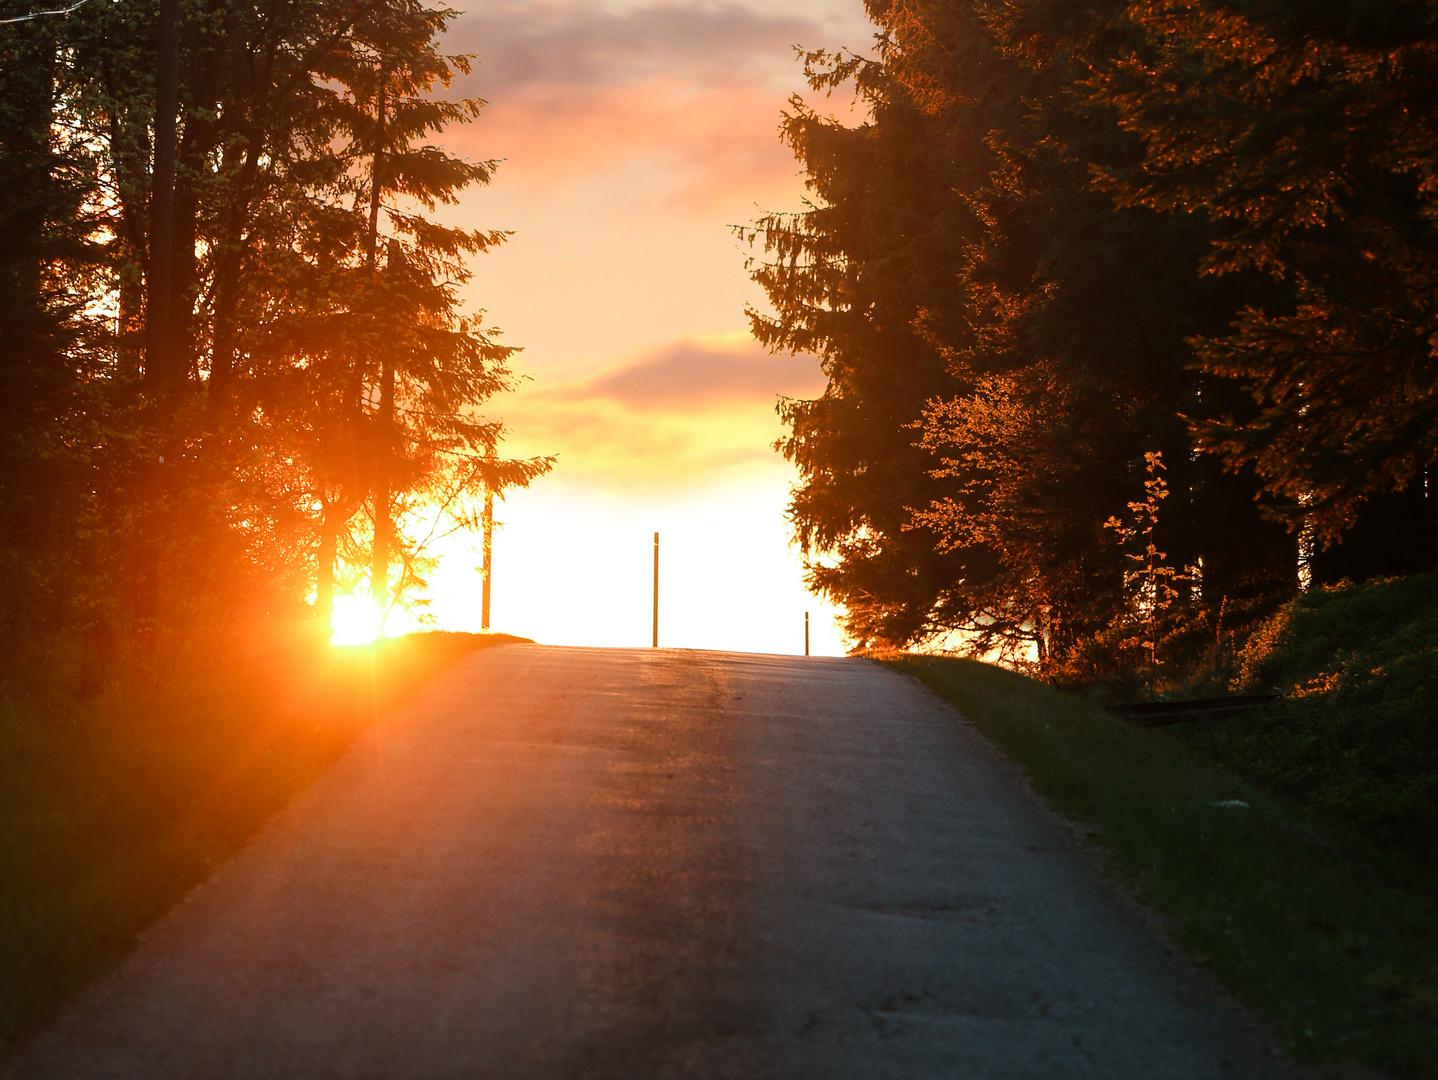 Sonnenuntergang an einem stillen Ort